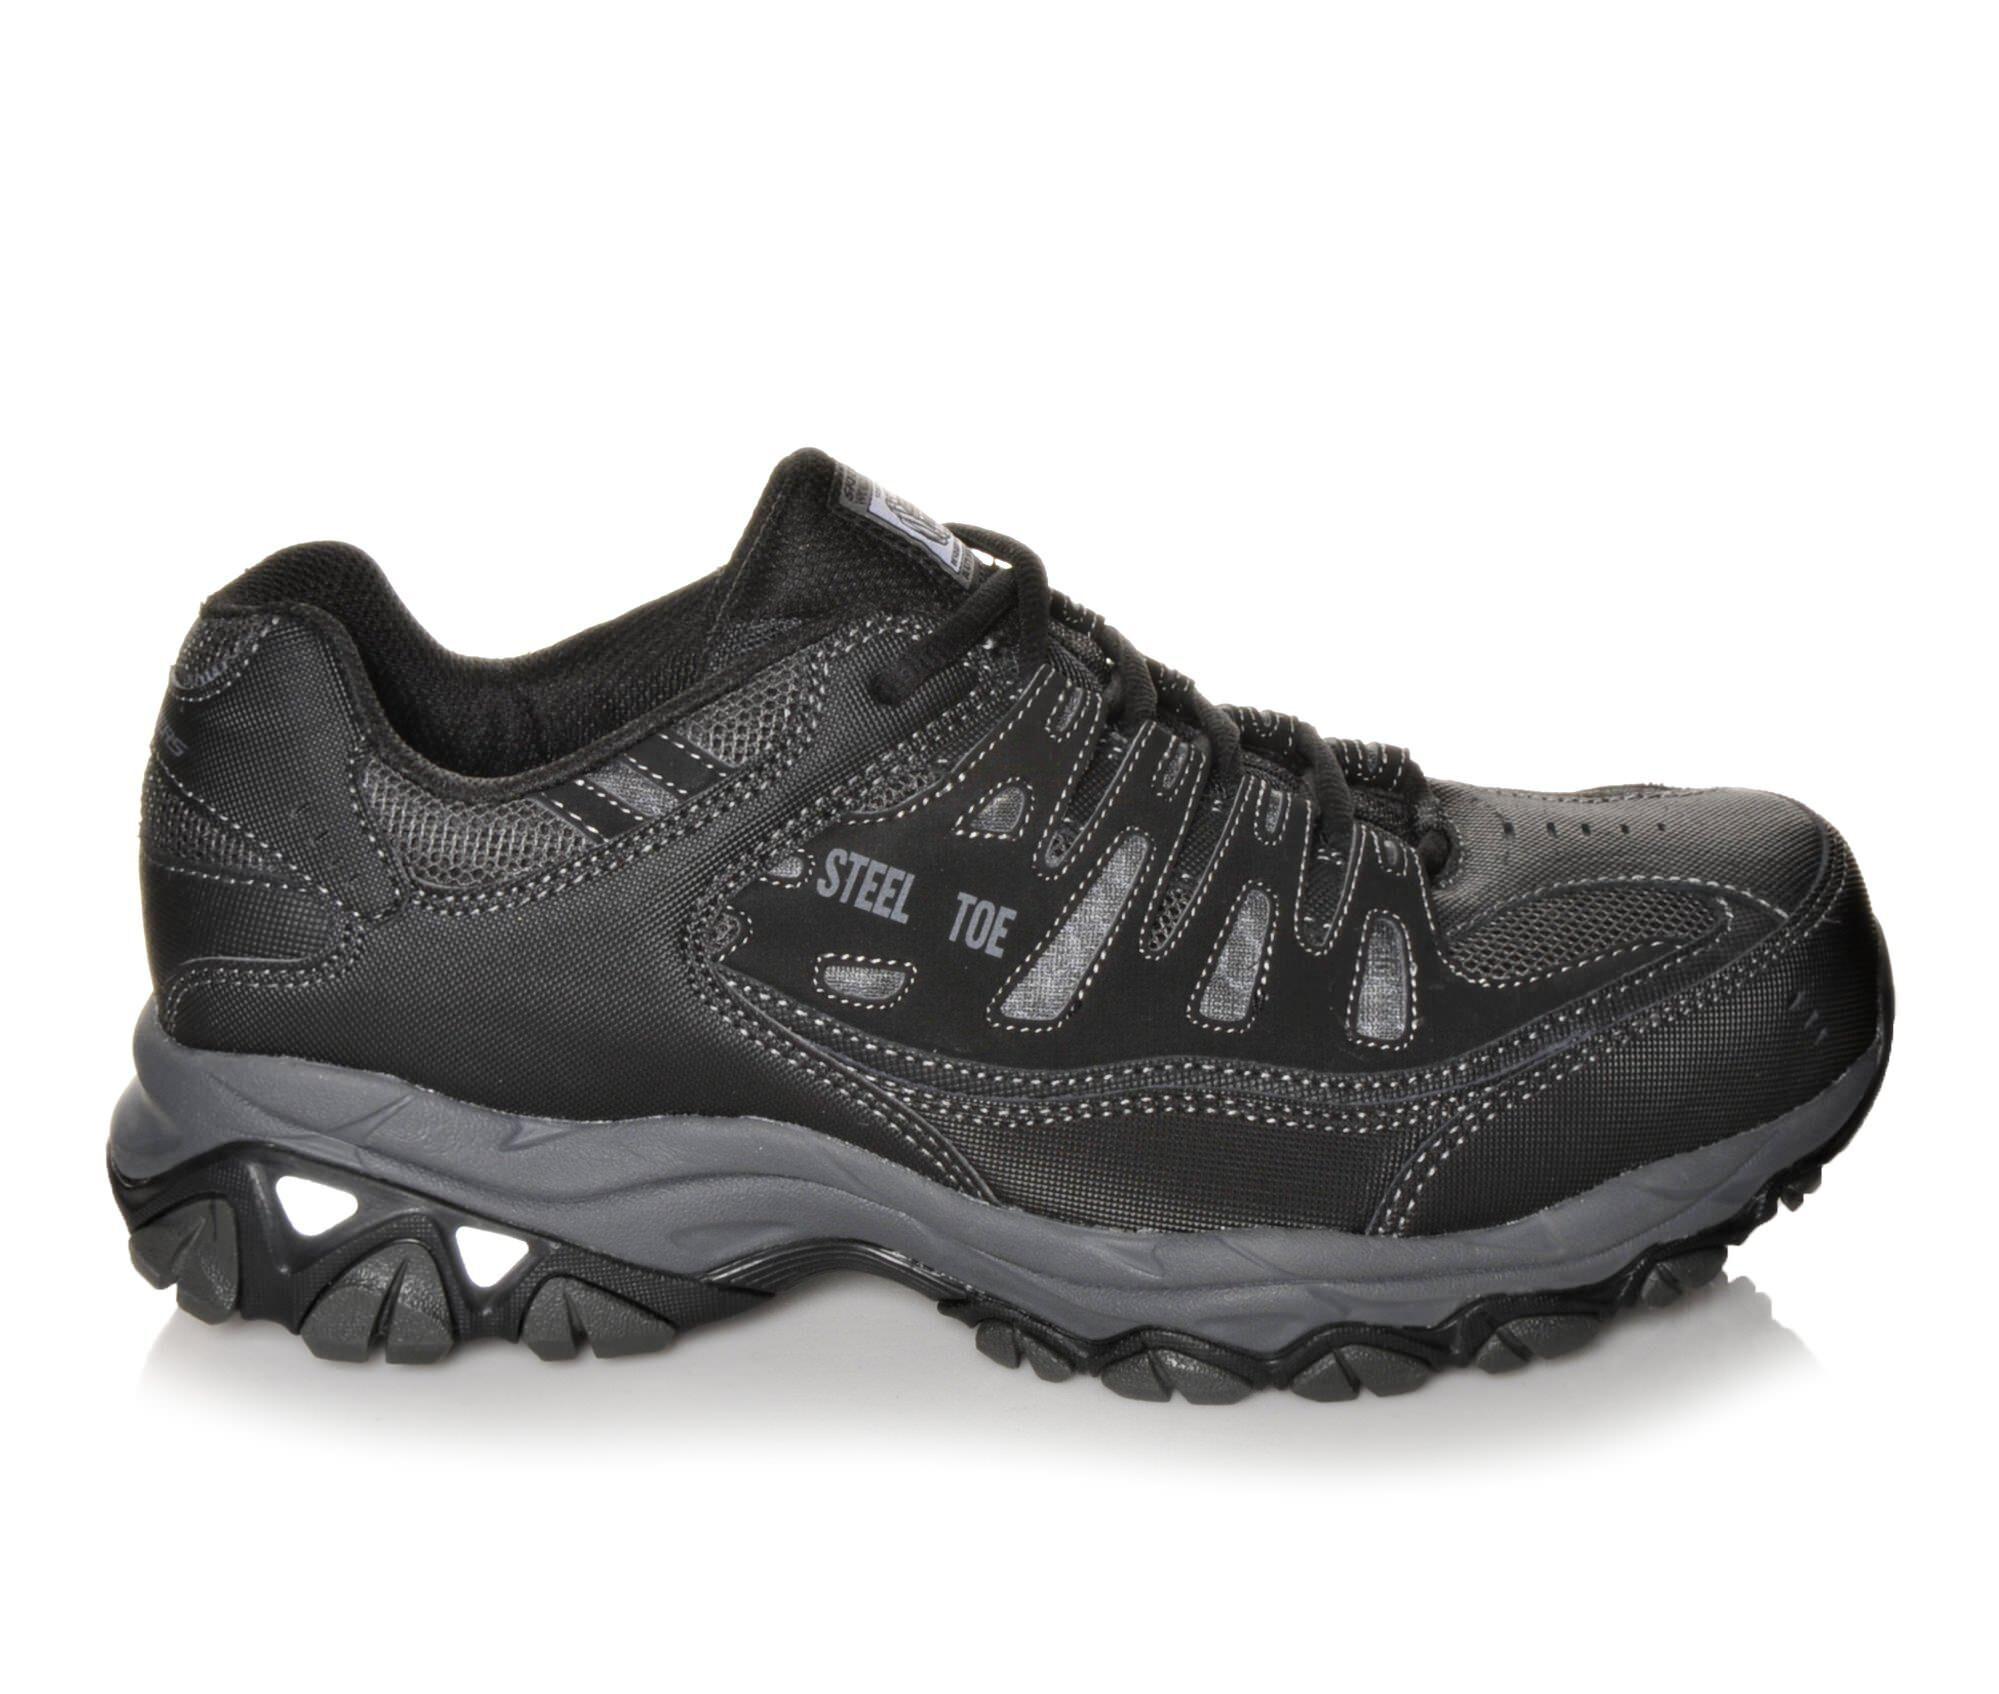 Men's Skechers Work 77055 Cankton Steel Toe Work Shoes Black/Charcoal